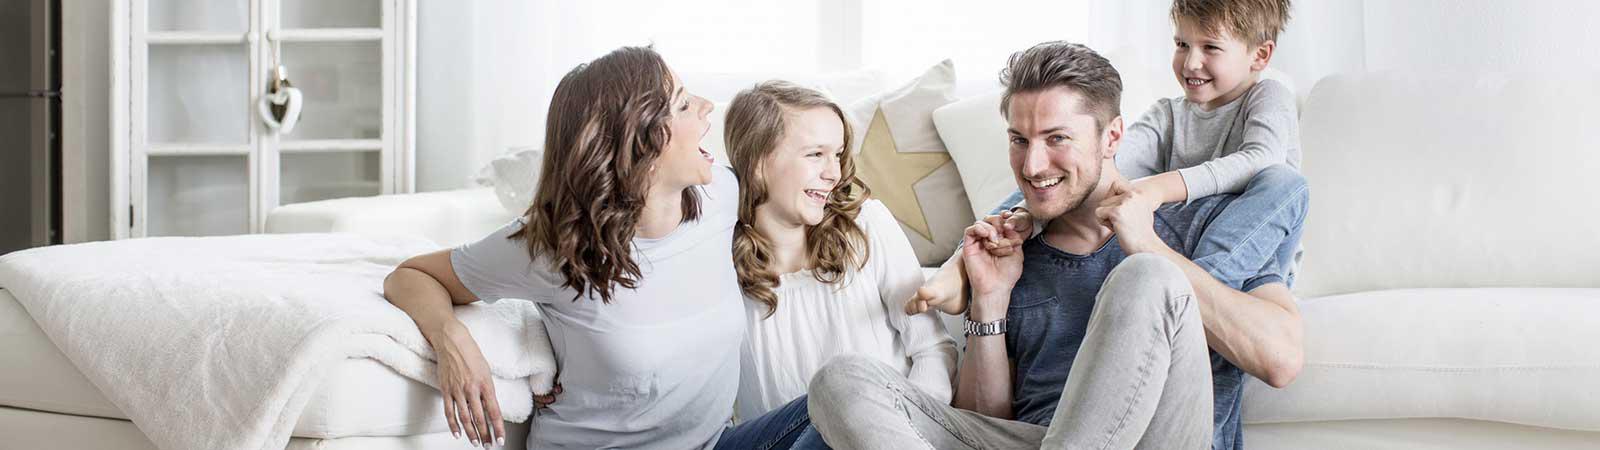 neue pelletheizung familiengl ck bei effizienzhaus online. Black Bedroom Furniture Sets. Home Design Ideas